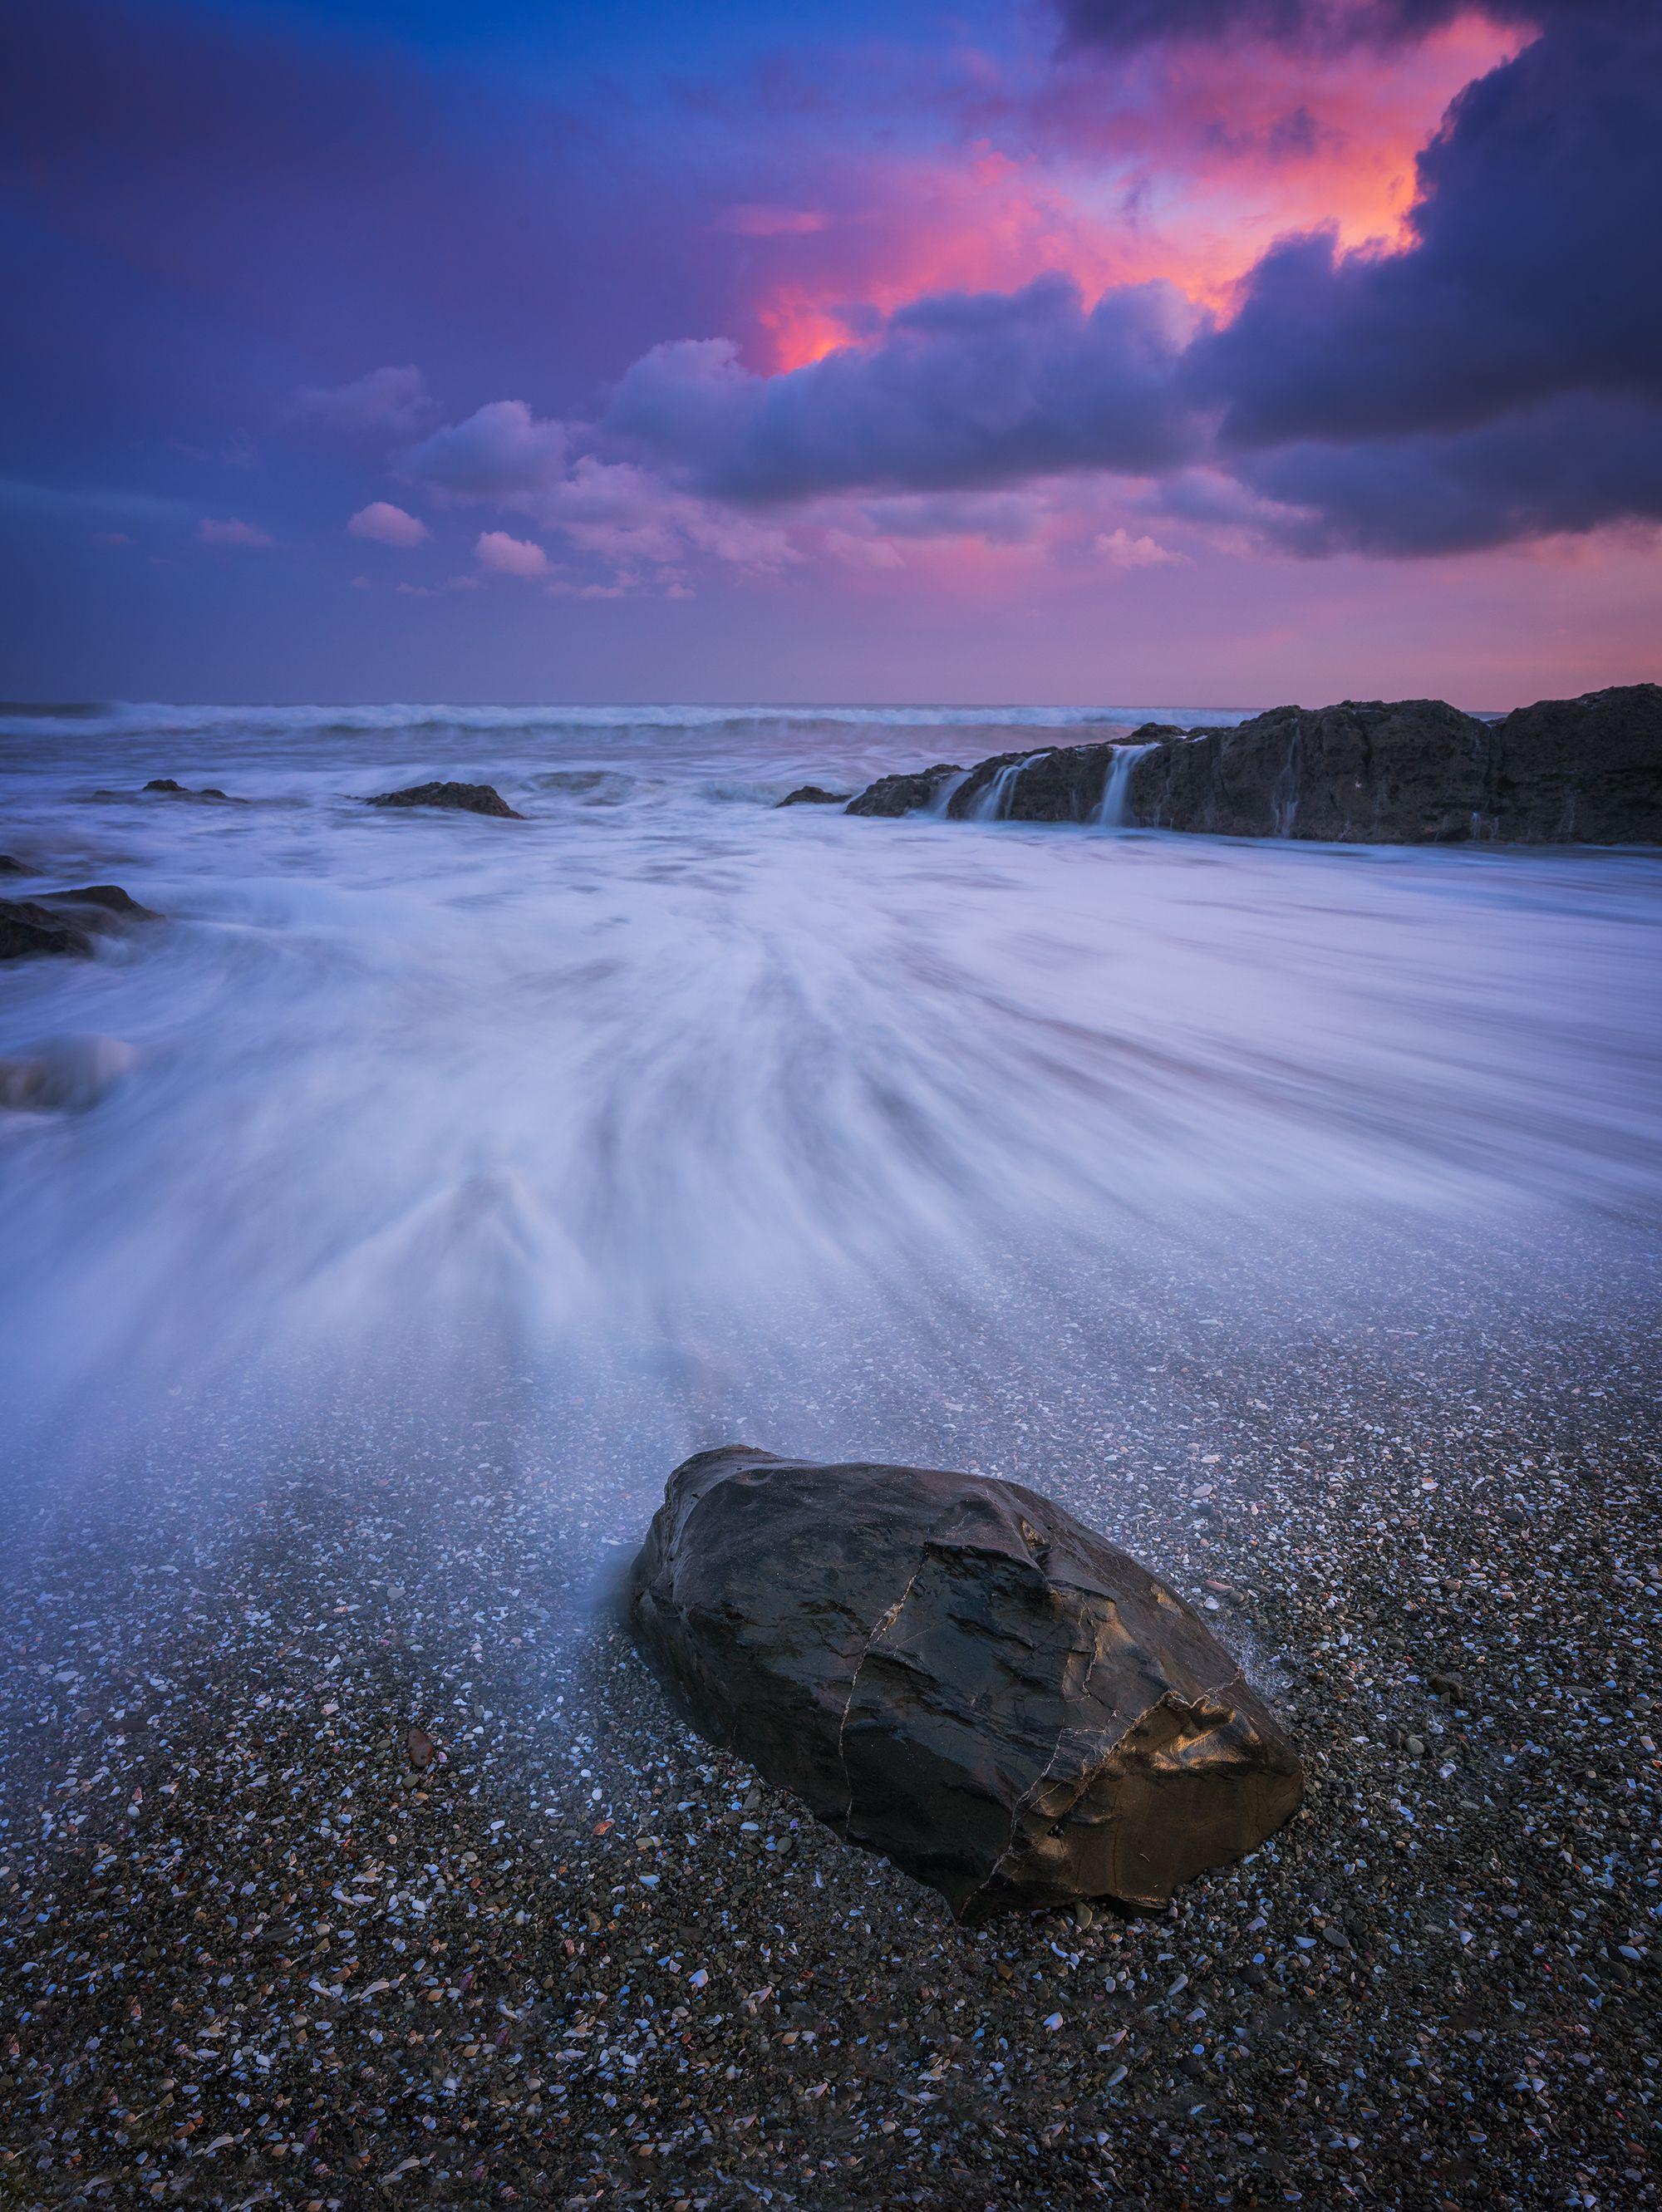 Colors In The Sky During Sunset  Santa Teresa Costa